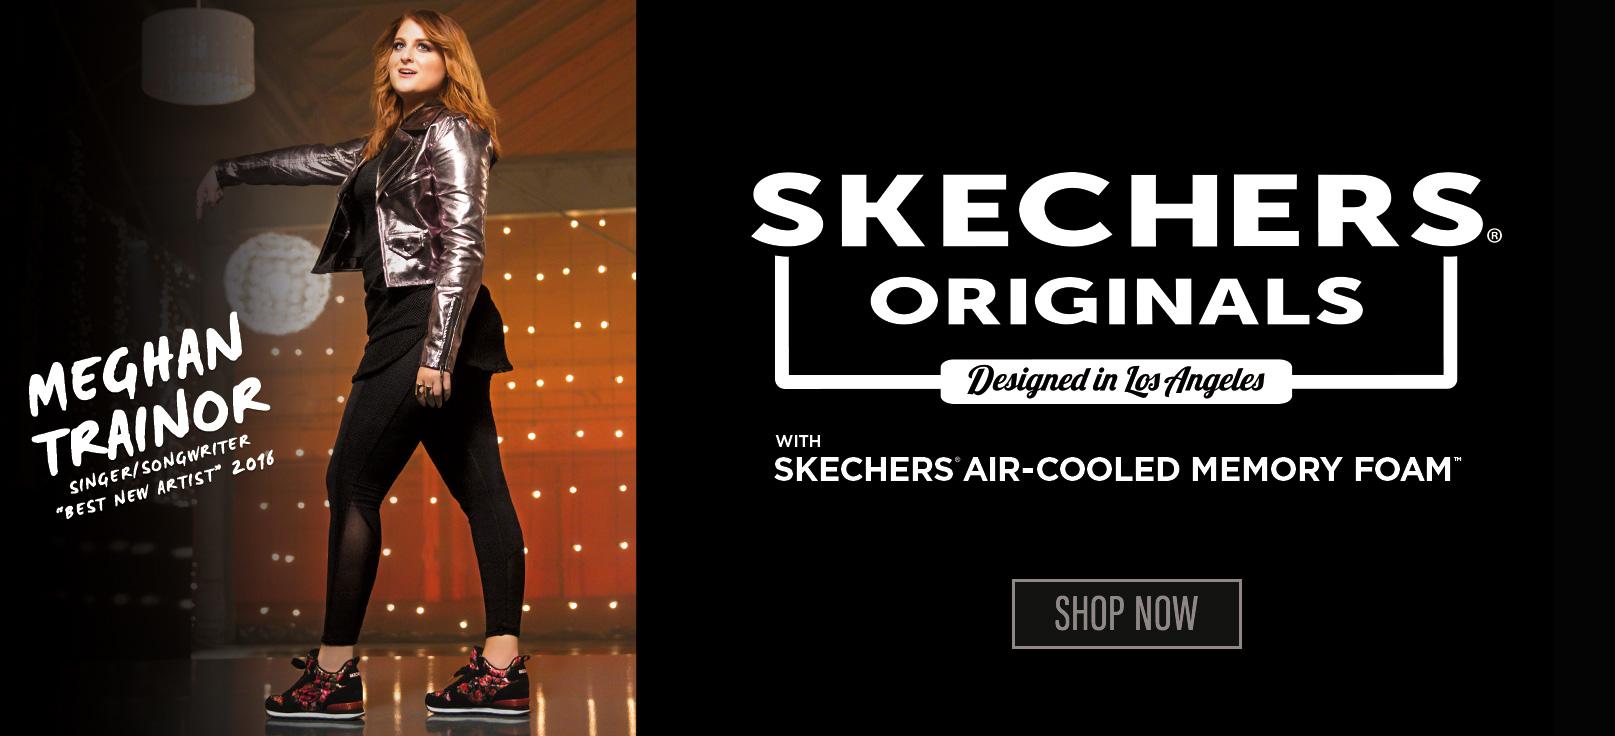 Entdecke Skechers Retro Sneaker mit Originals